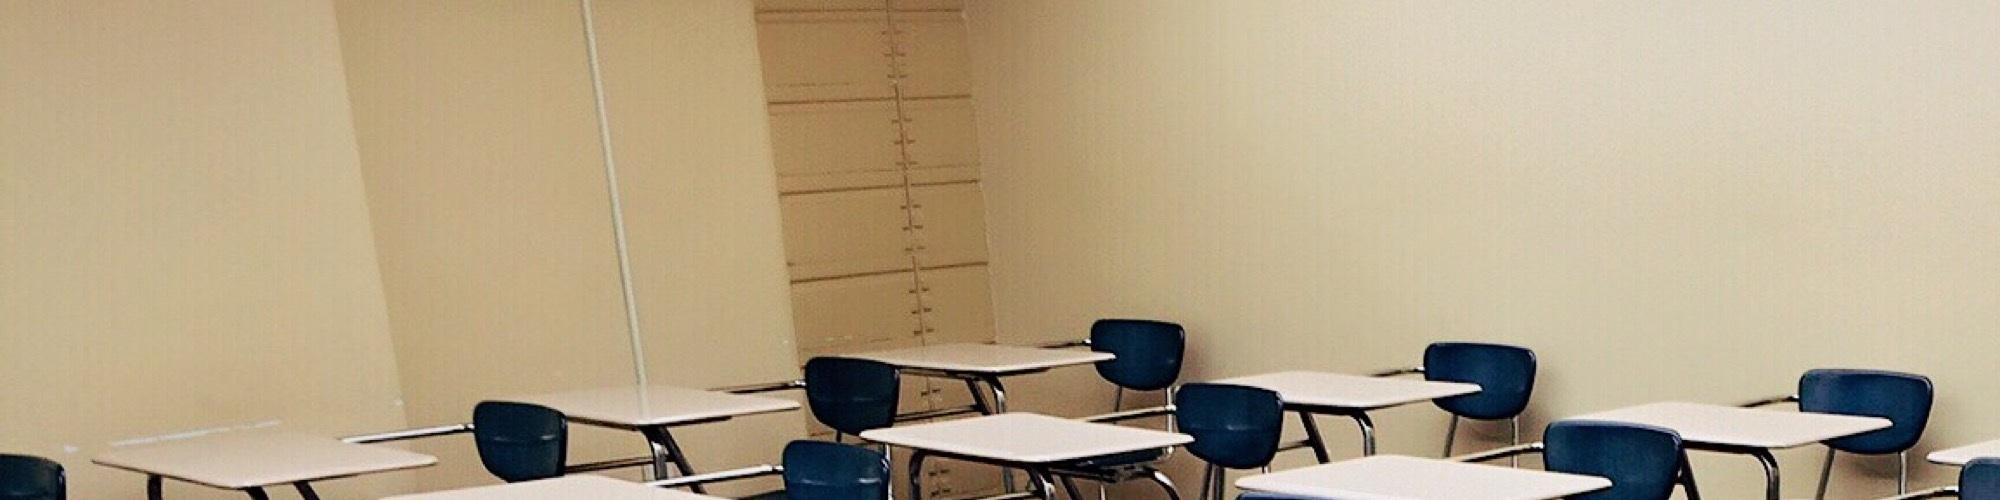 Autisme cluster 3 school